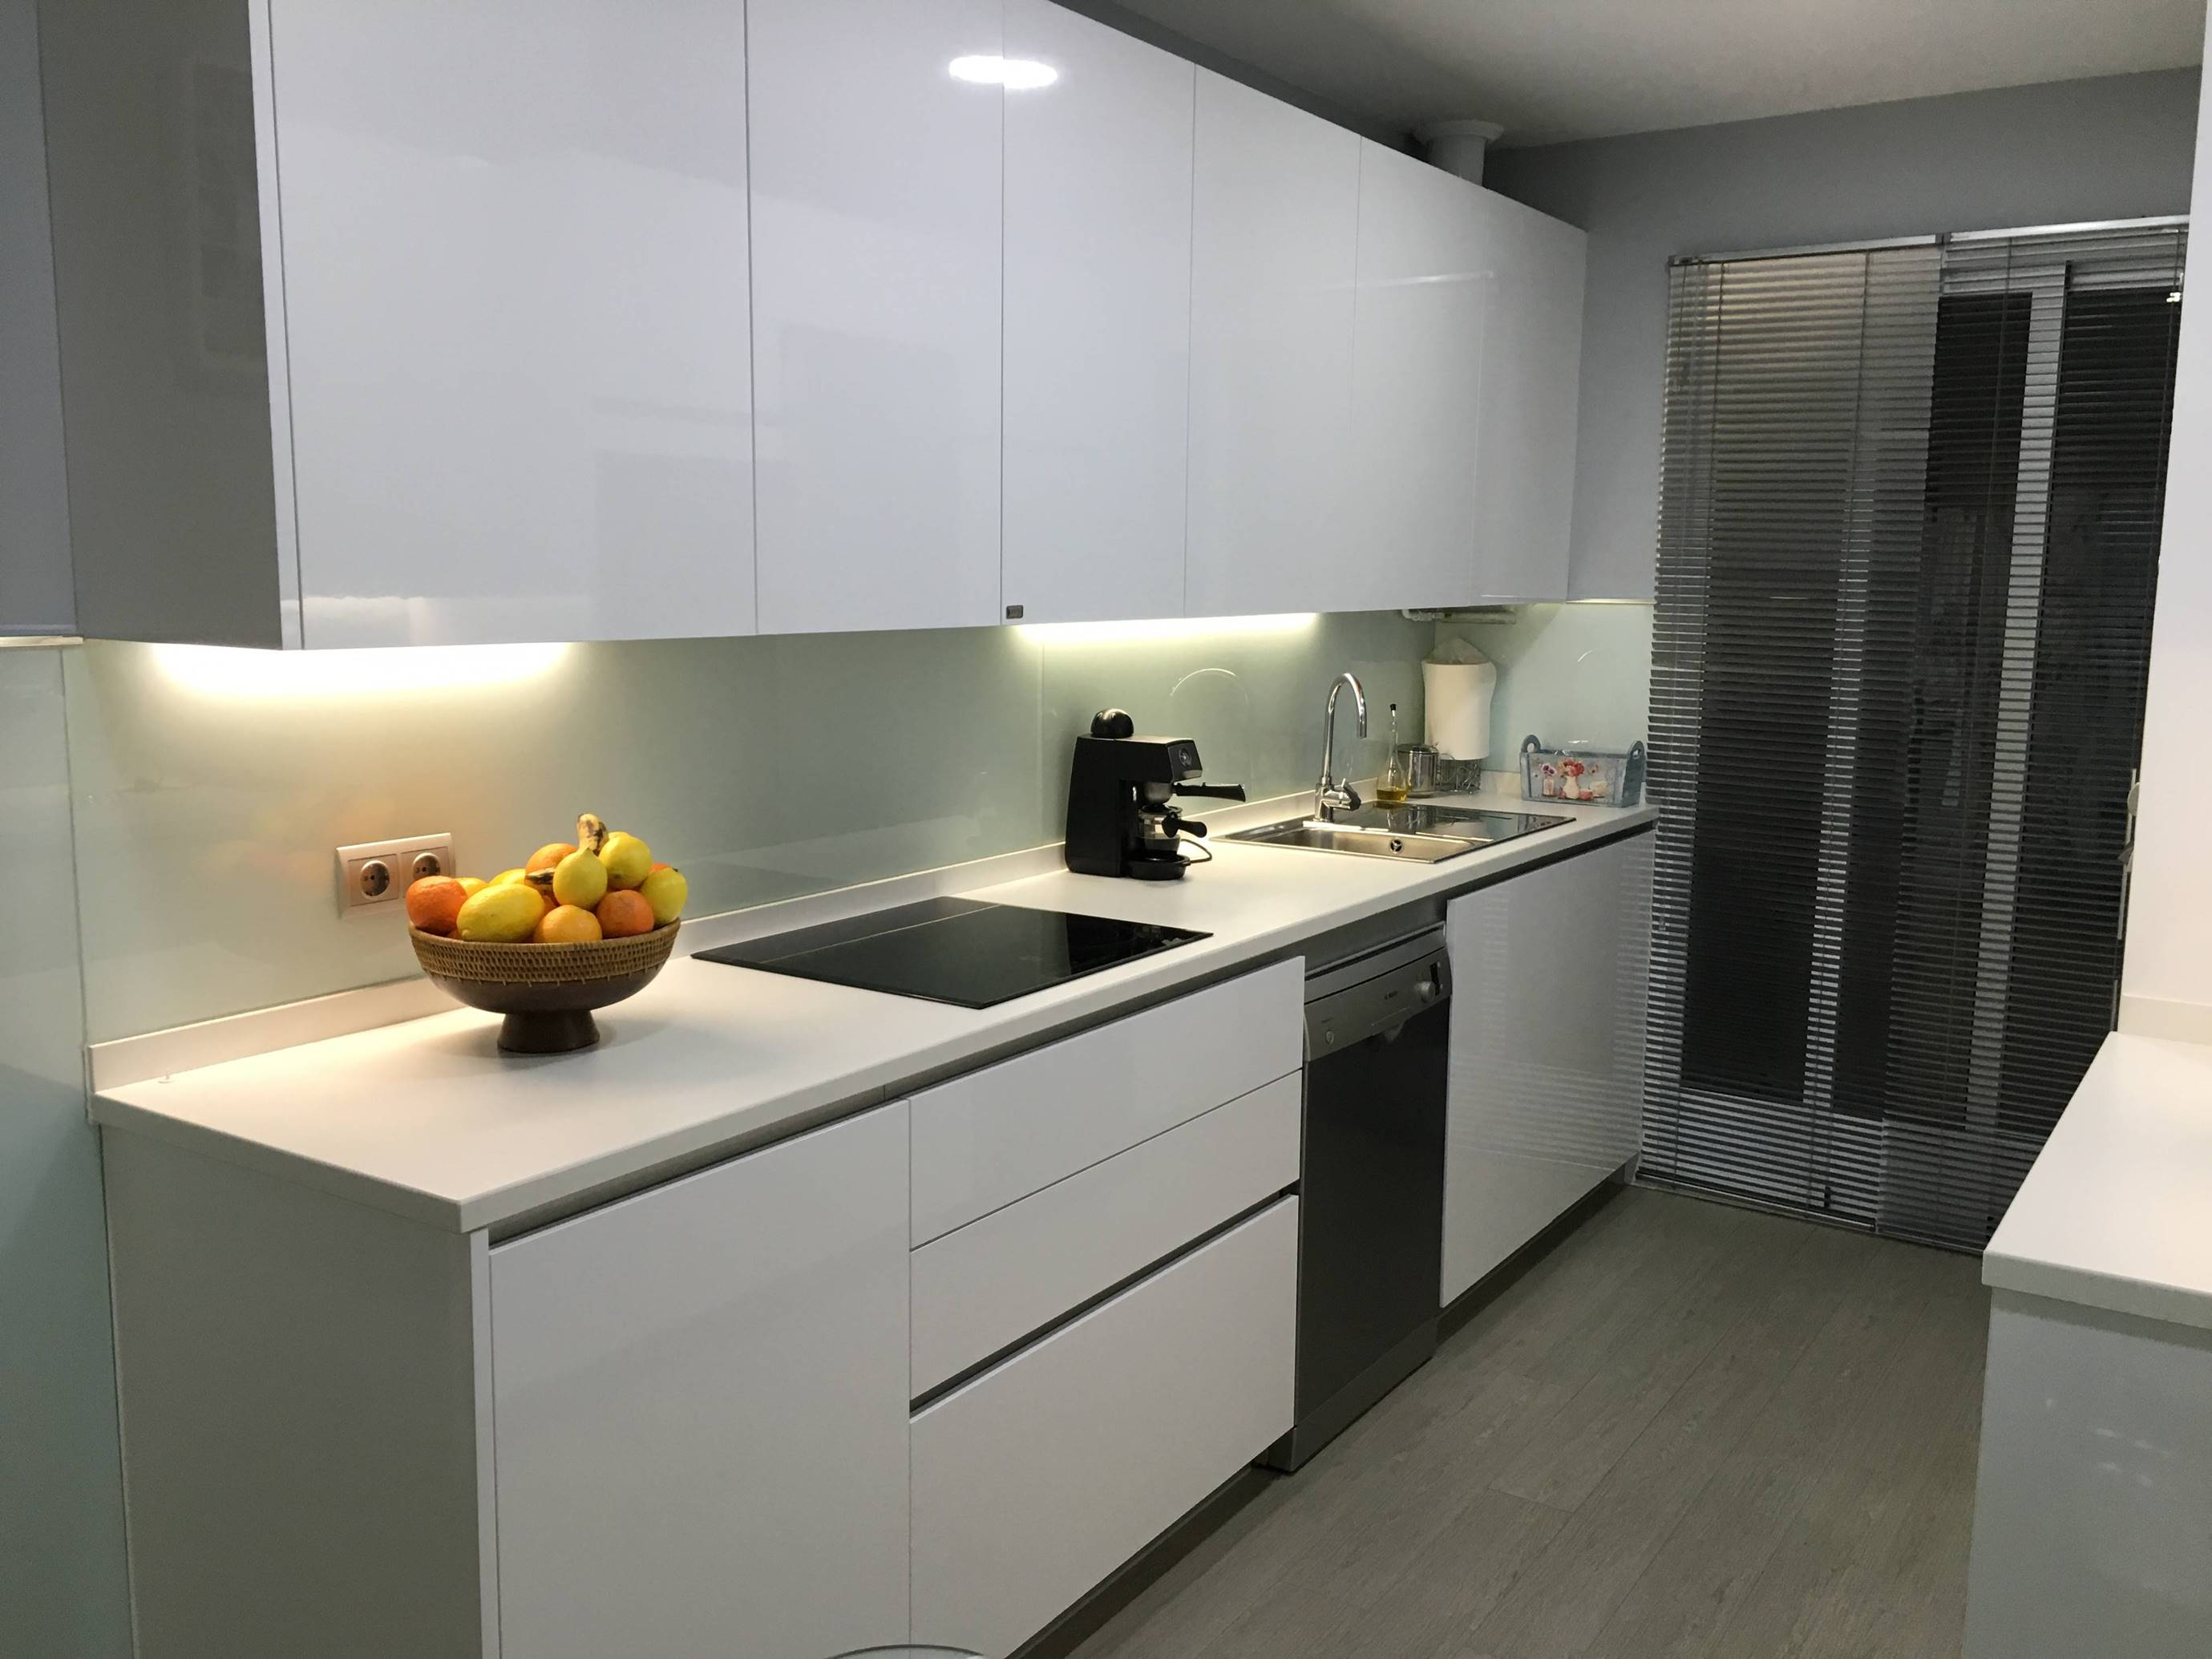 Muebles de cocina blancos sin tiradores ideas interesantes para dise ar los - Cocina sin tiradores ...